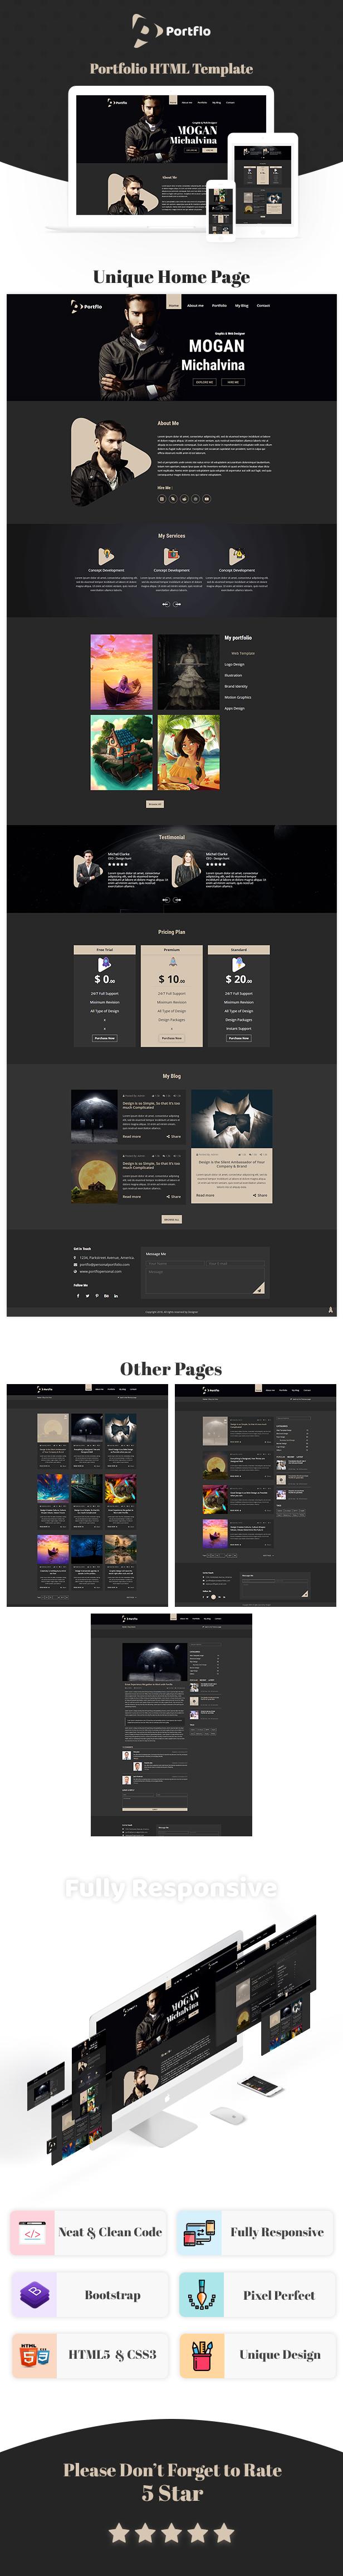 Portflo - Portfolio Landing Page HTML Template by themepoo | ThemeForest